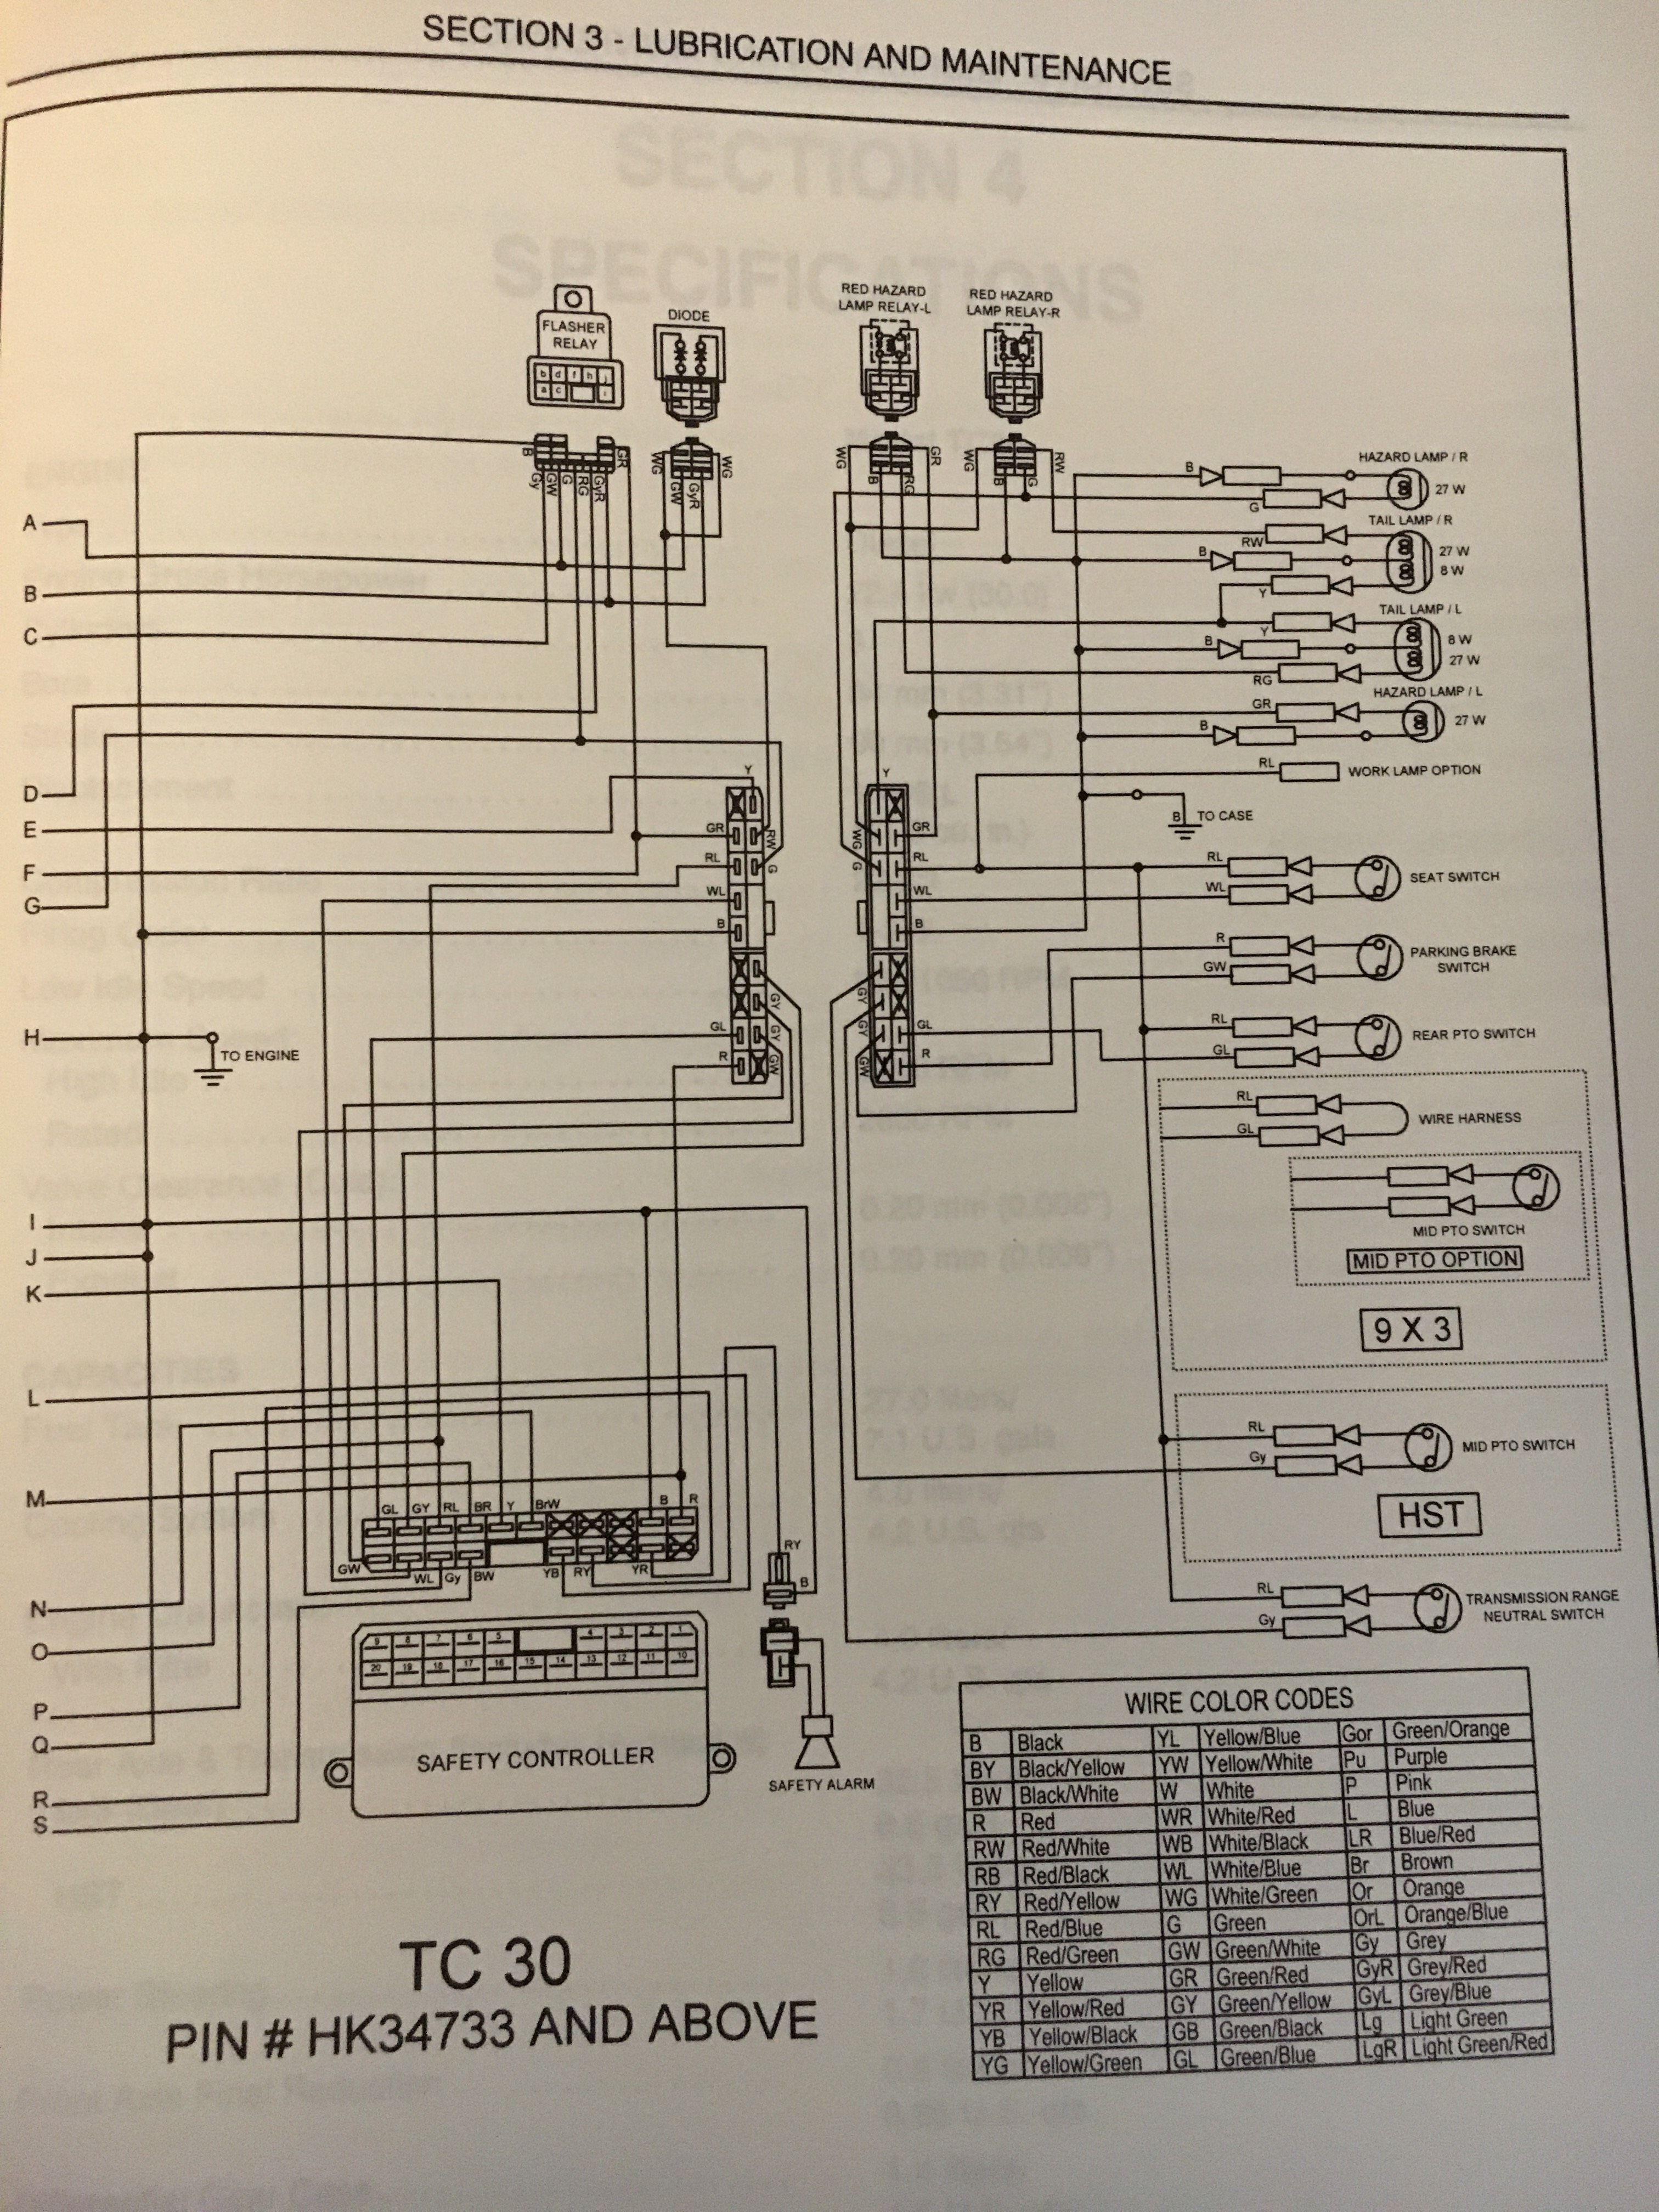 [DIAGRAM_3ER]  FM_2741] New Holland Tc30 Wiring Diagram Download Diagram | New Holland Wiring Diagrams |  | Bios Effl Cajos Vira Mohammedshrine Librar Wiring 101